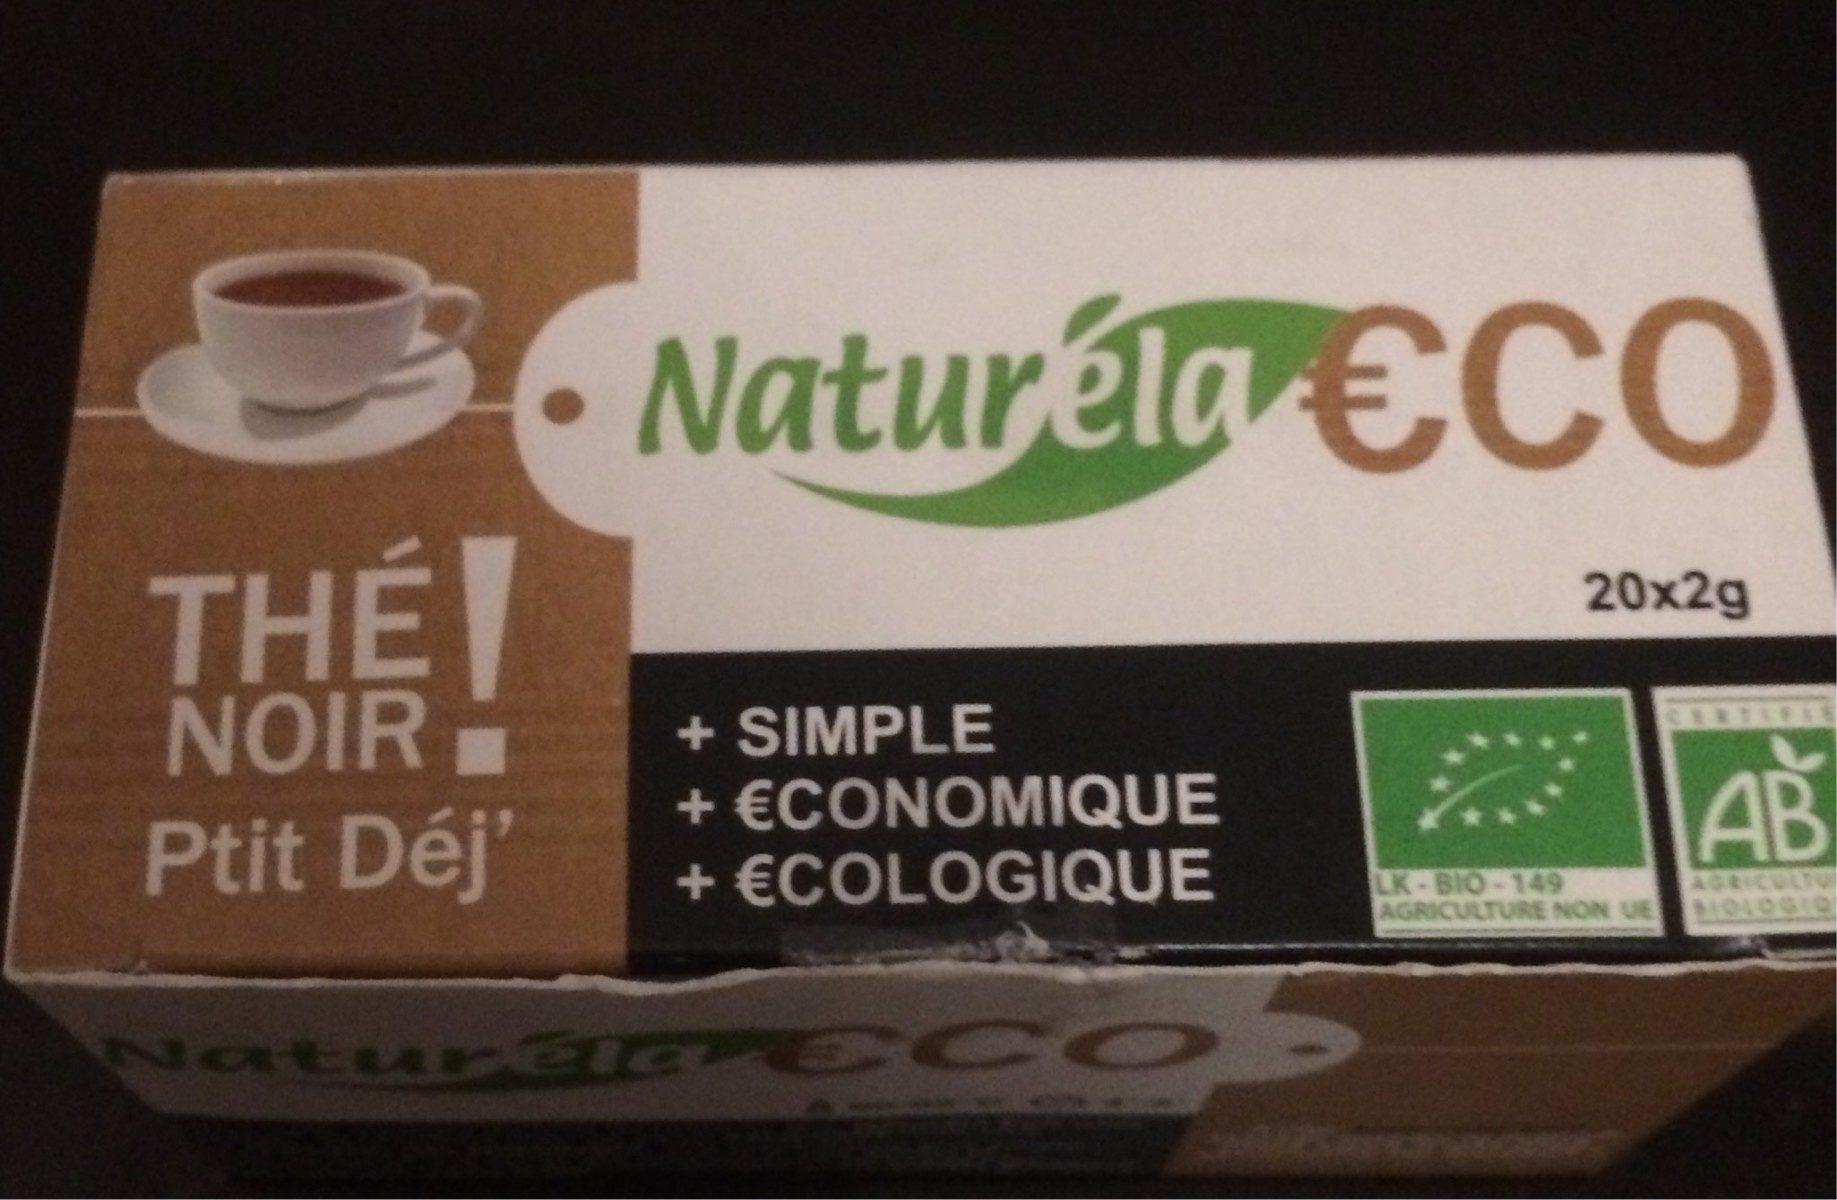 Thé noir - Product - fr